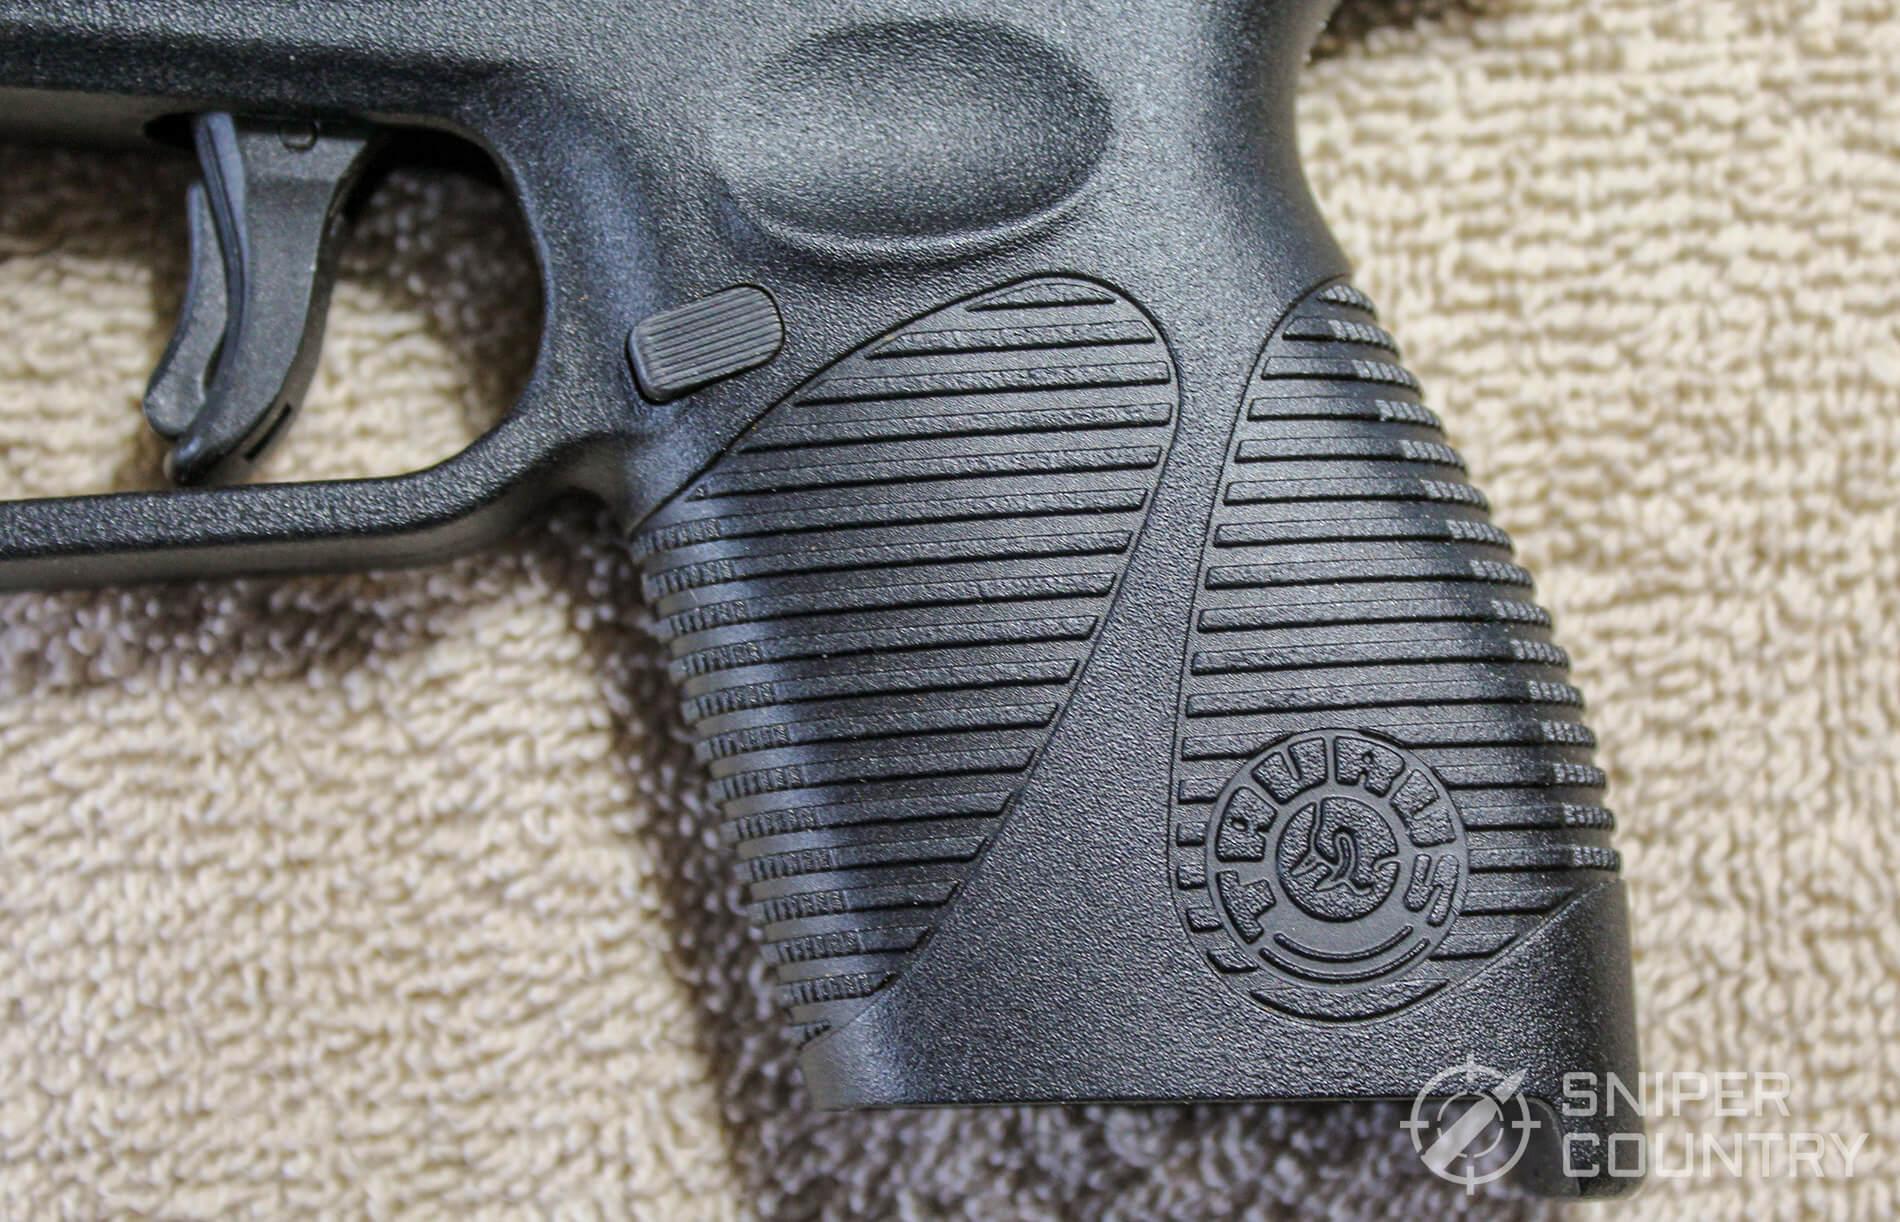 Taurus 709 Slim grip